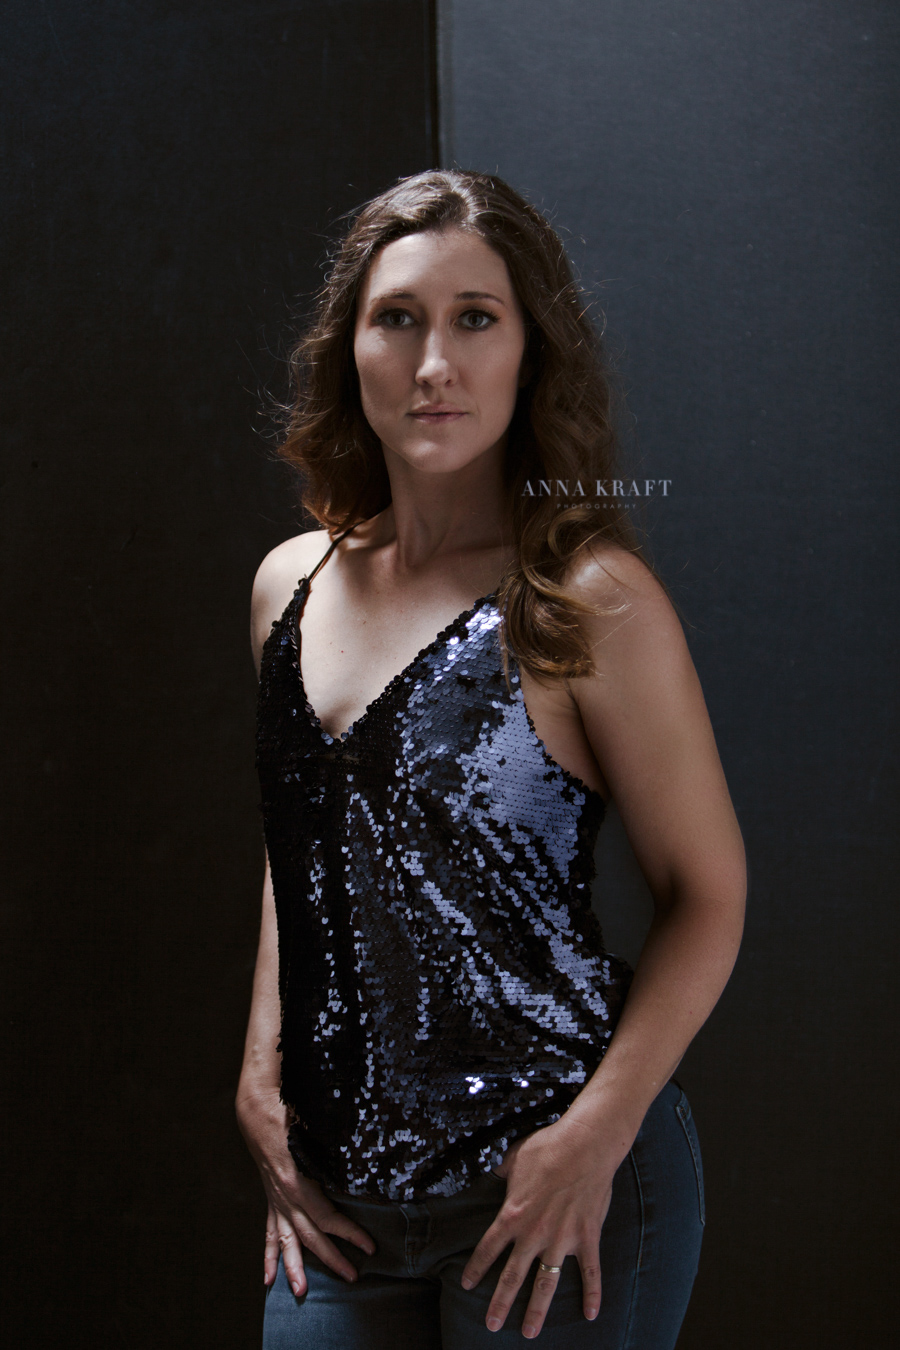 anna_kraft_photography_georgetown_square_studio_motherhood_beauty_portrait-15.jpg